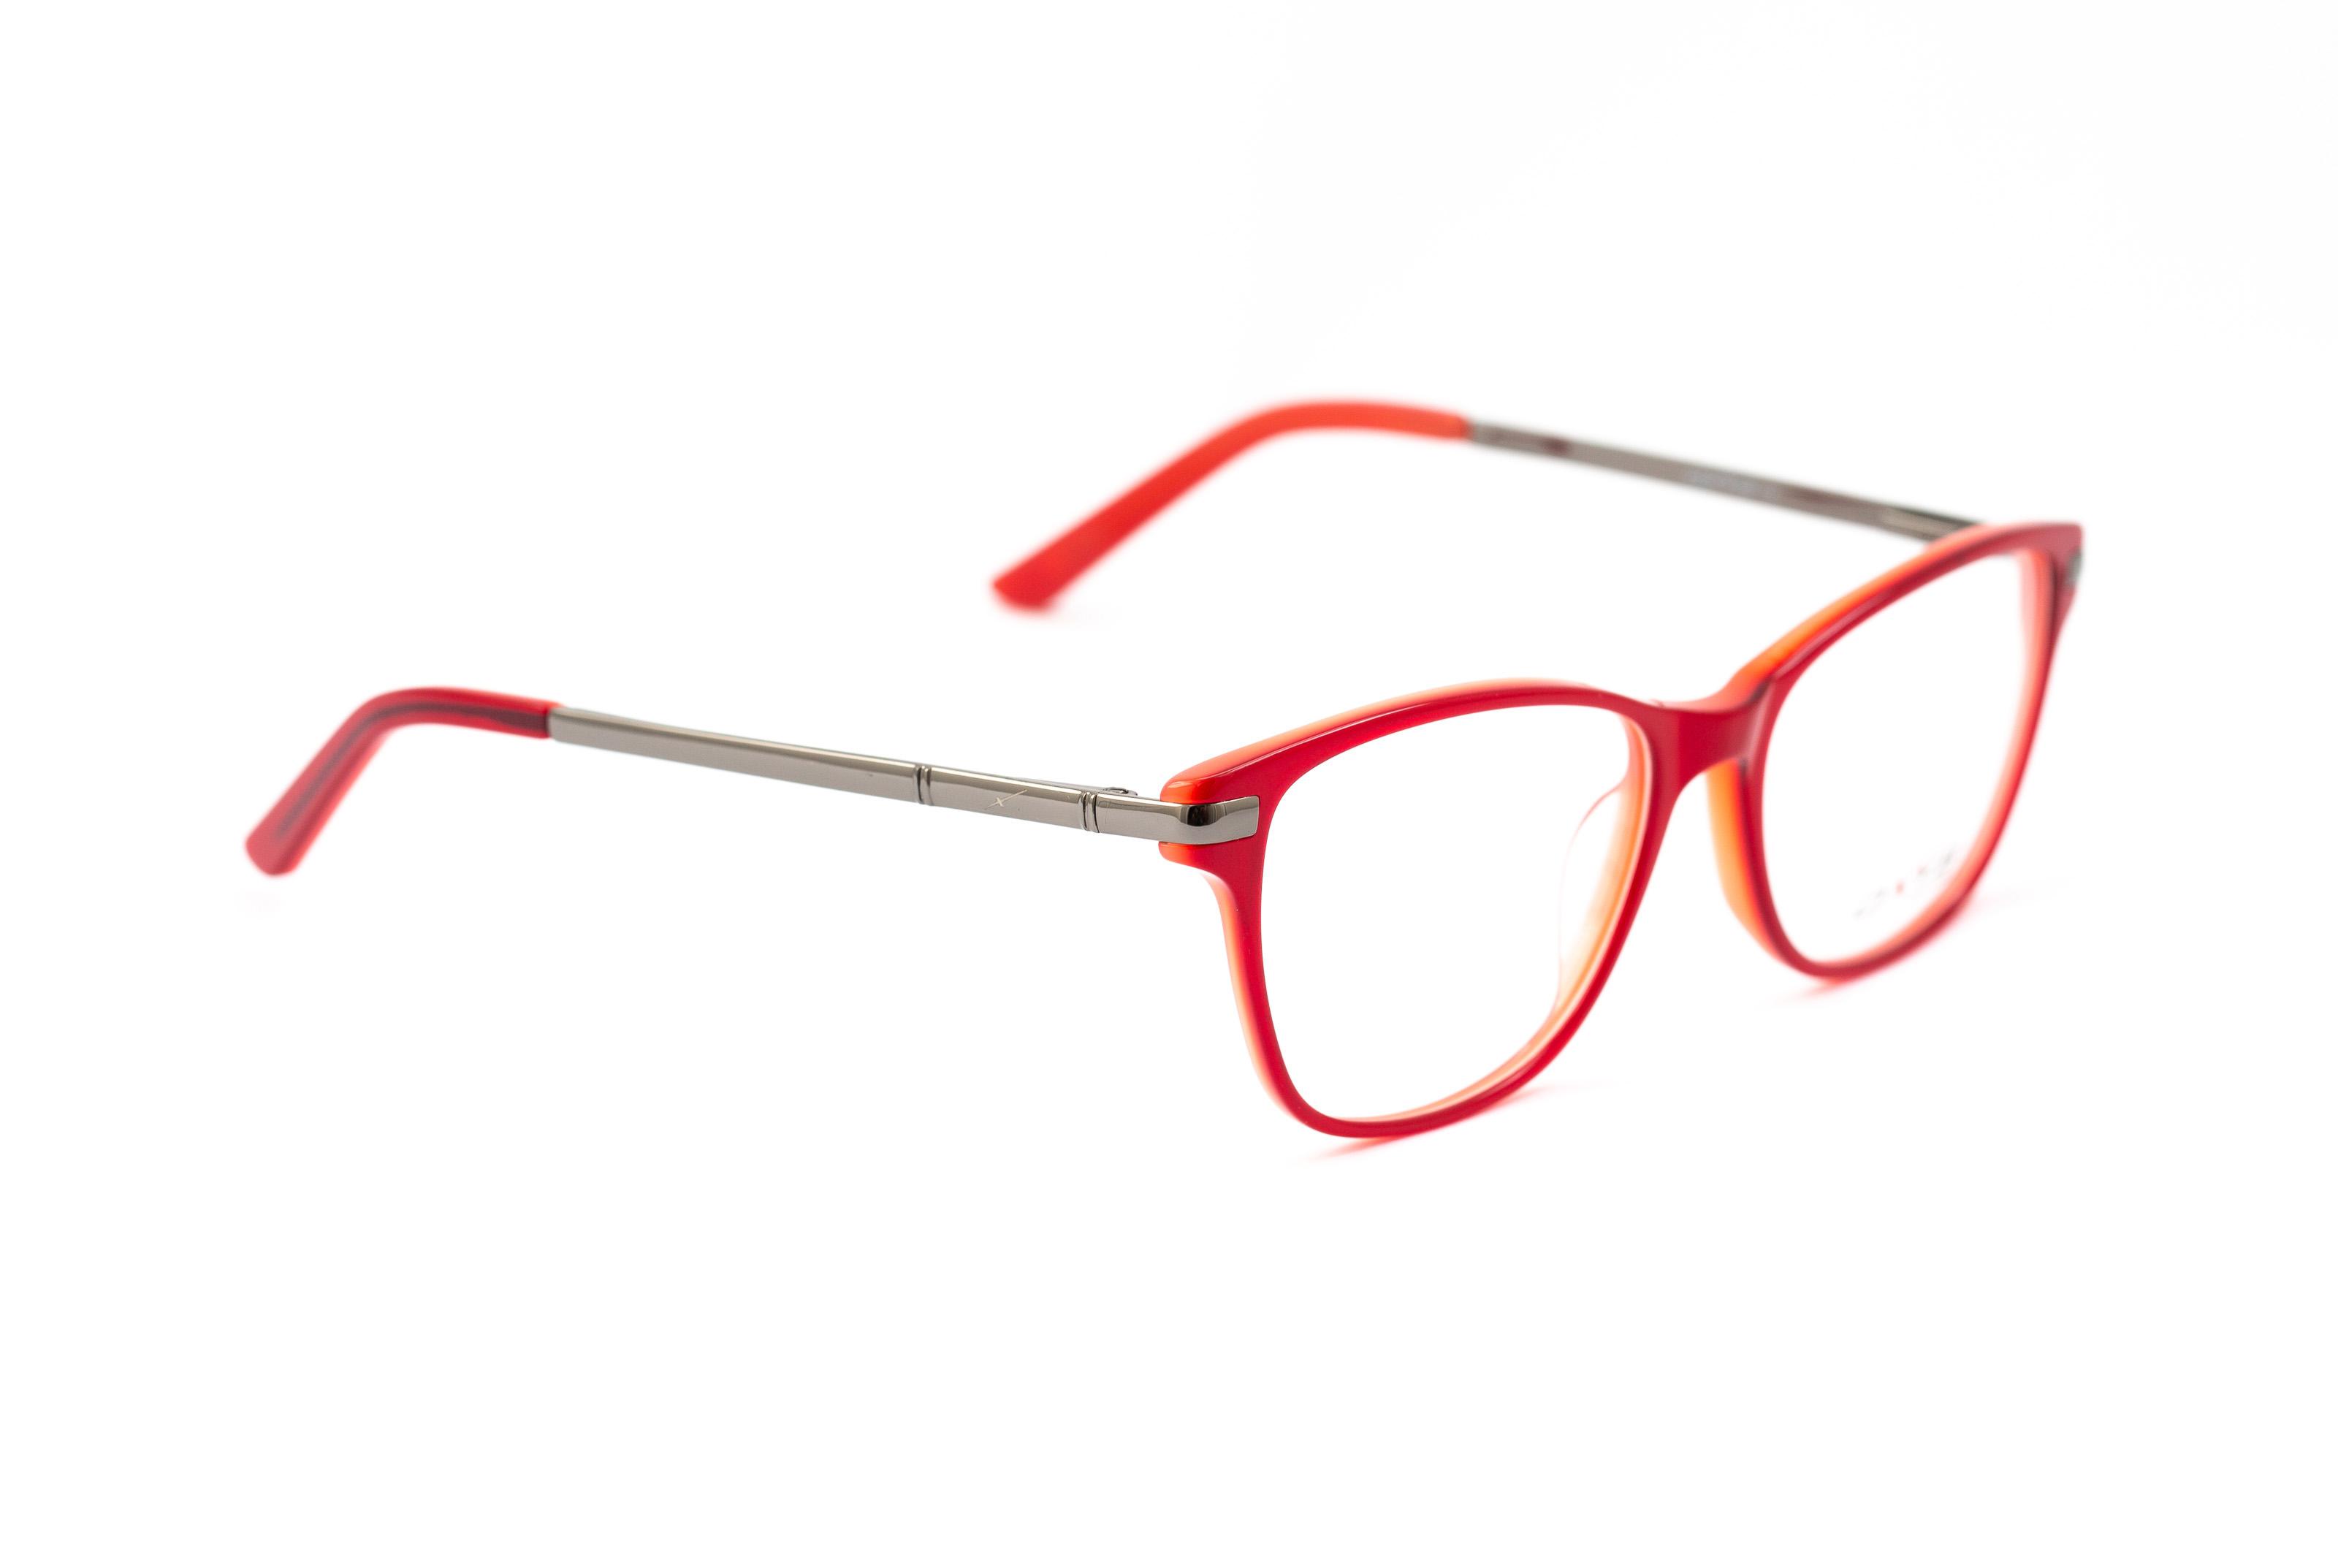 Rama de ochelari Oxys VX2009C3